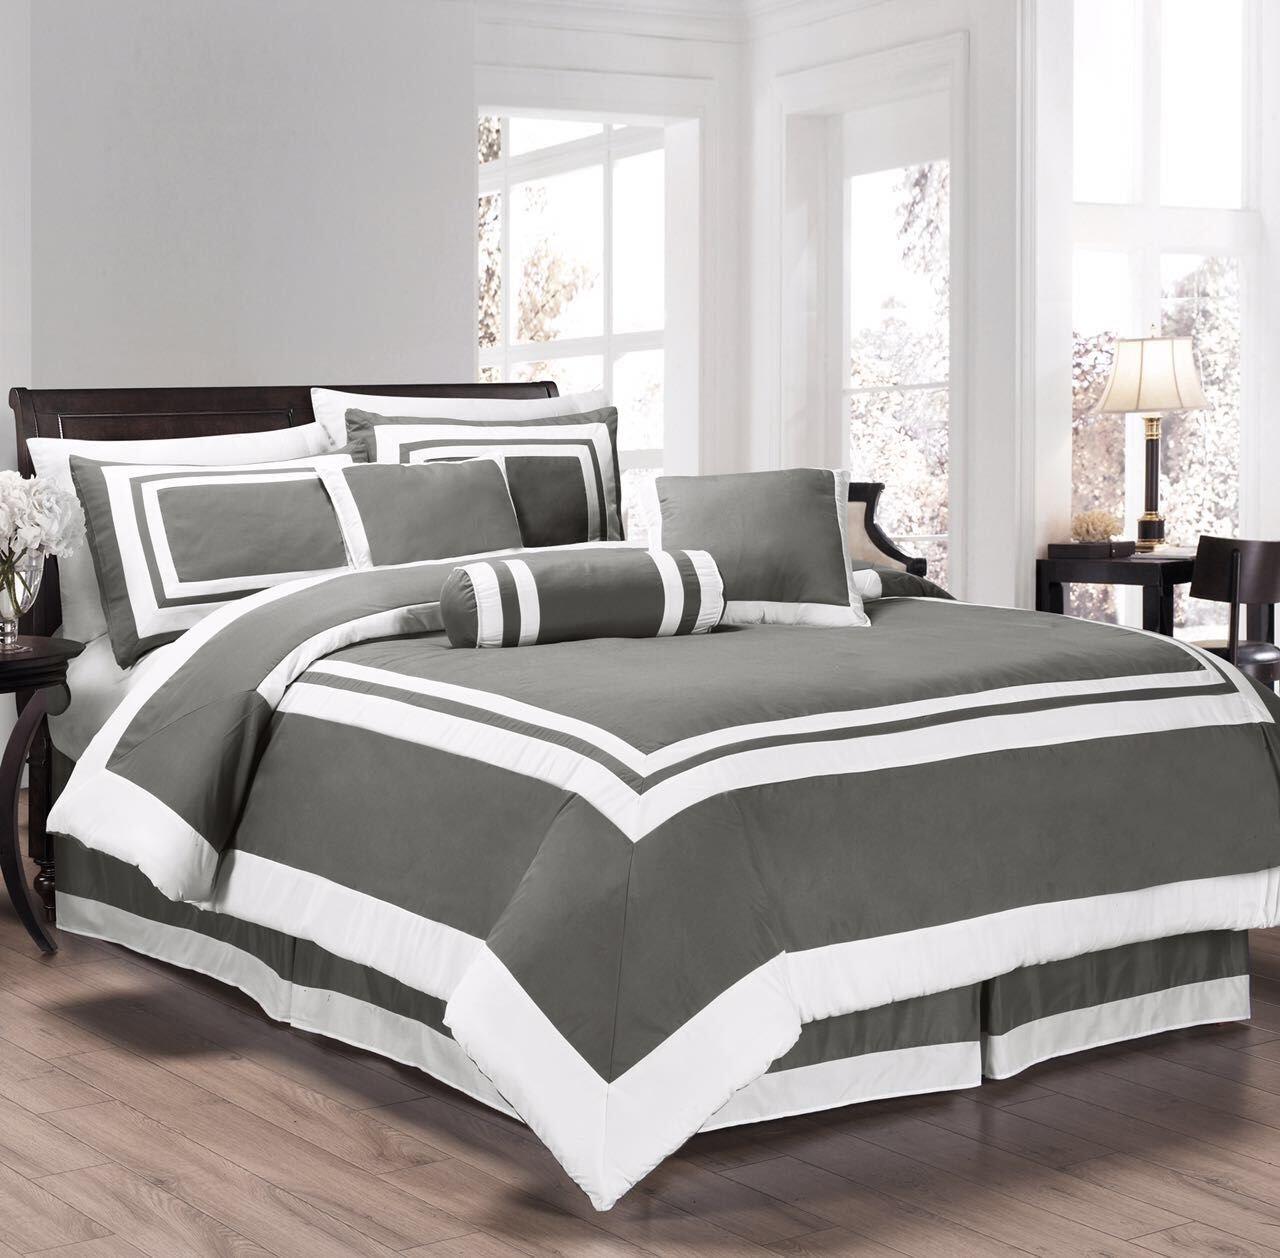 california king bedding